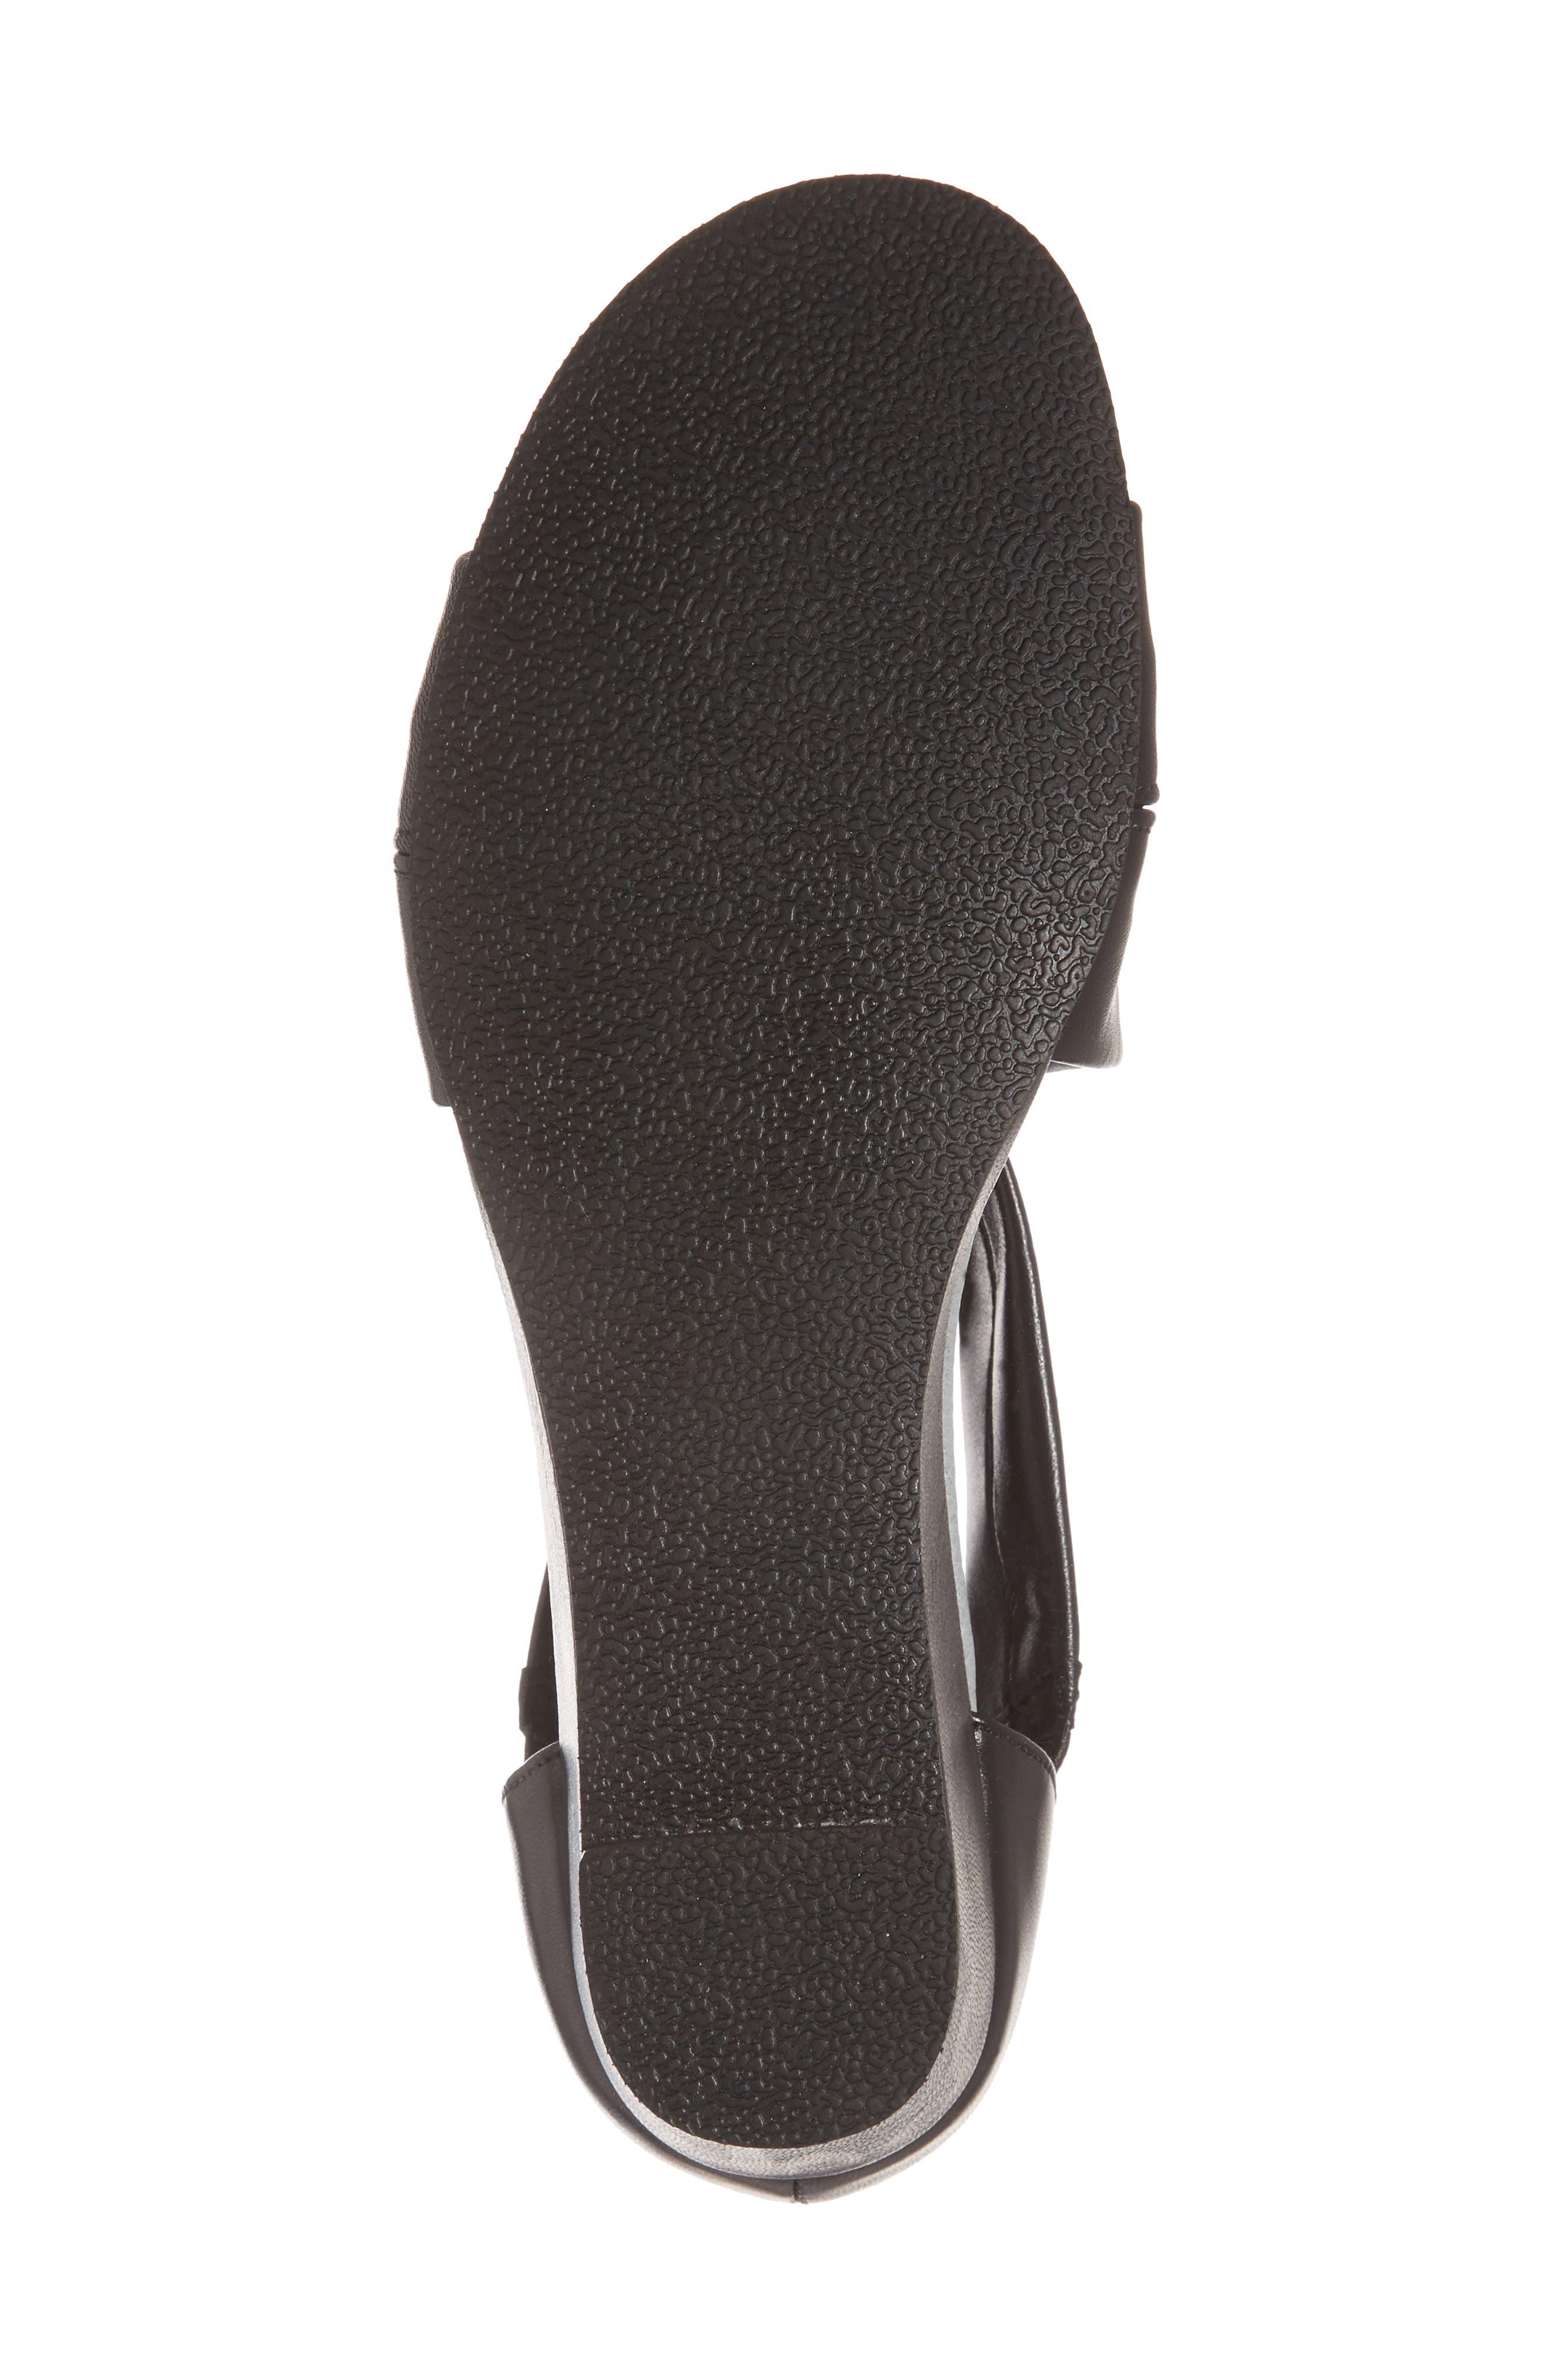 DAVID TATE,                             Swell Cross Strap Wedge Sandal,                             Alternate thumbnail 6, color,                             BLACK LEATHER